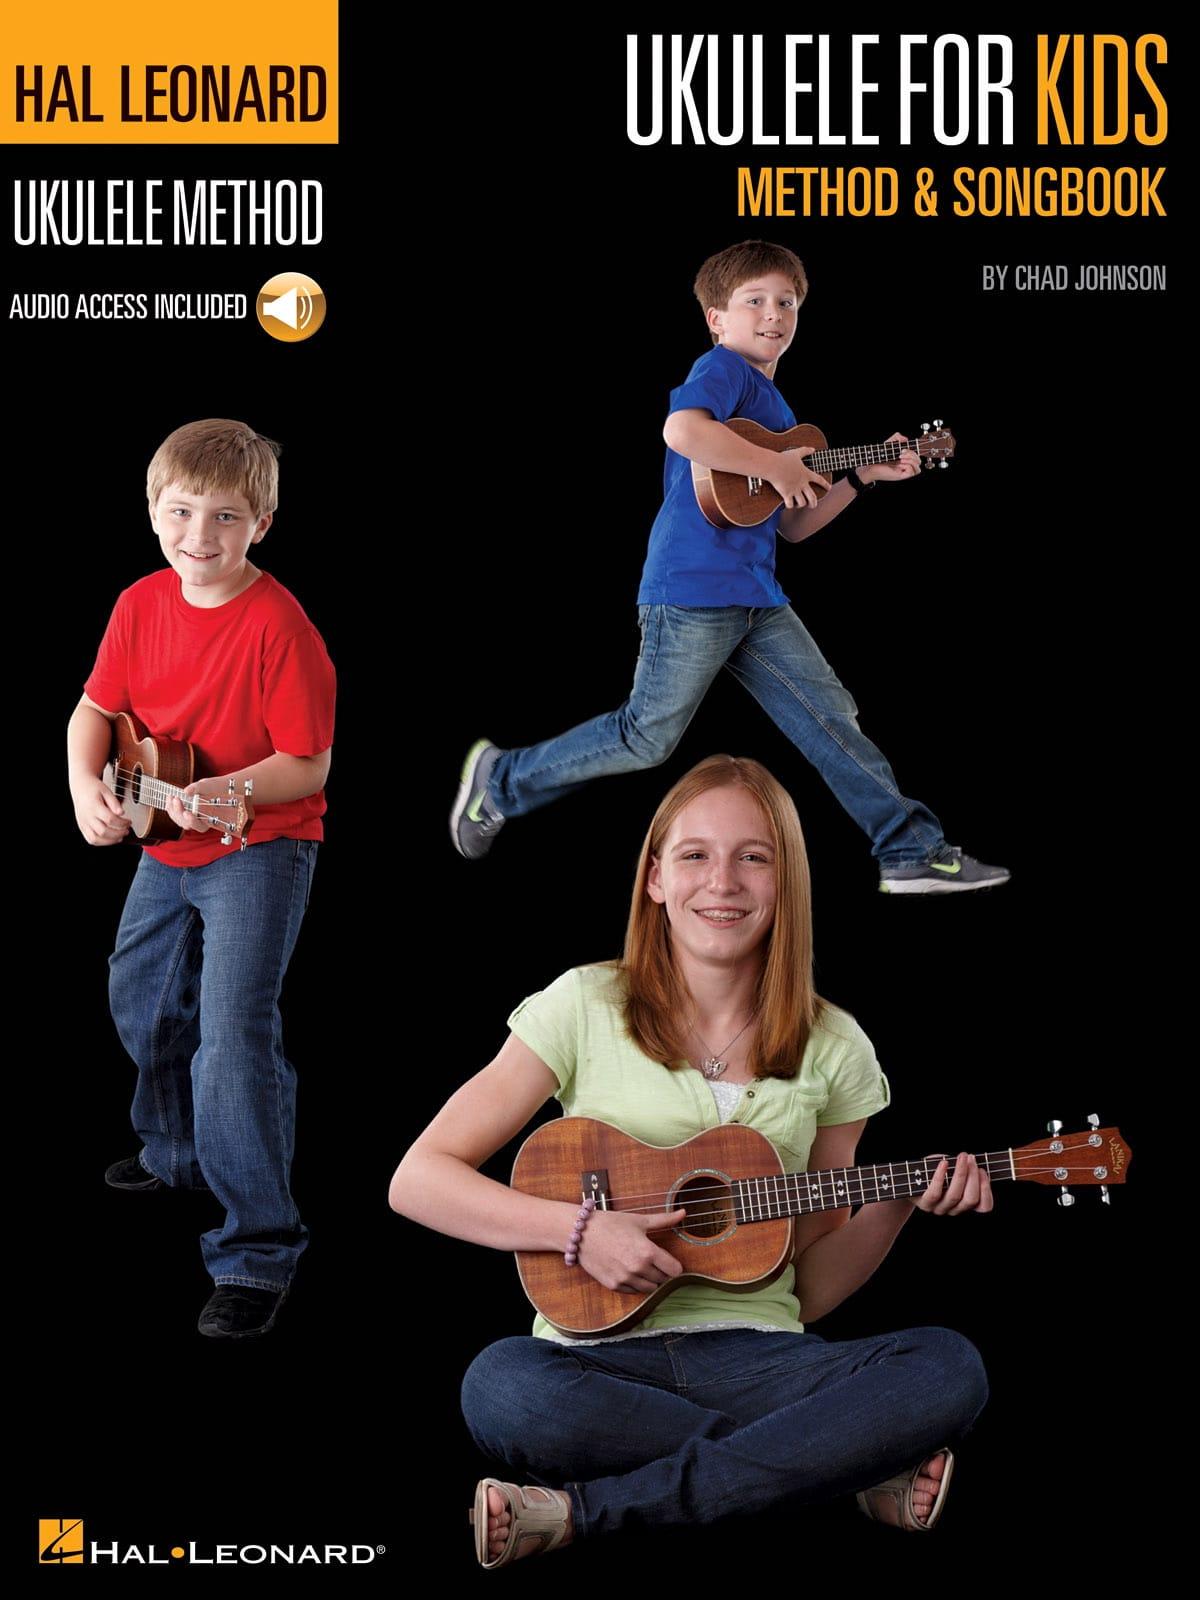 Ukulele for Kids Method & Songbook - Chad Johnson - laflutedepan.com